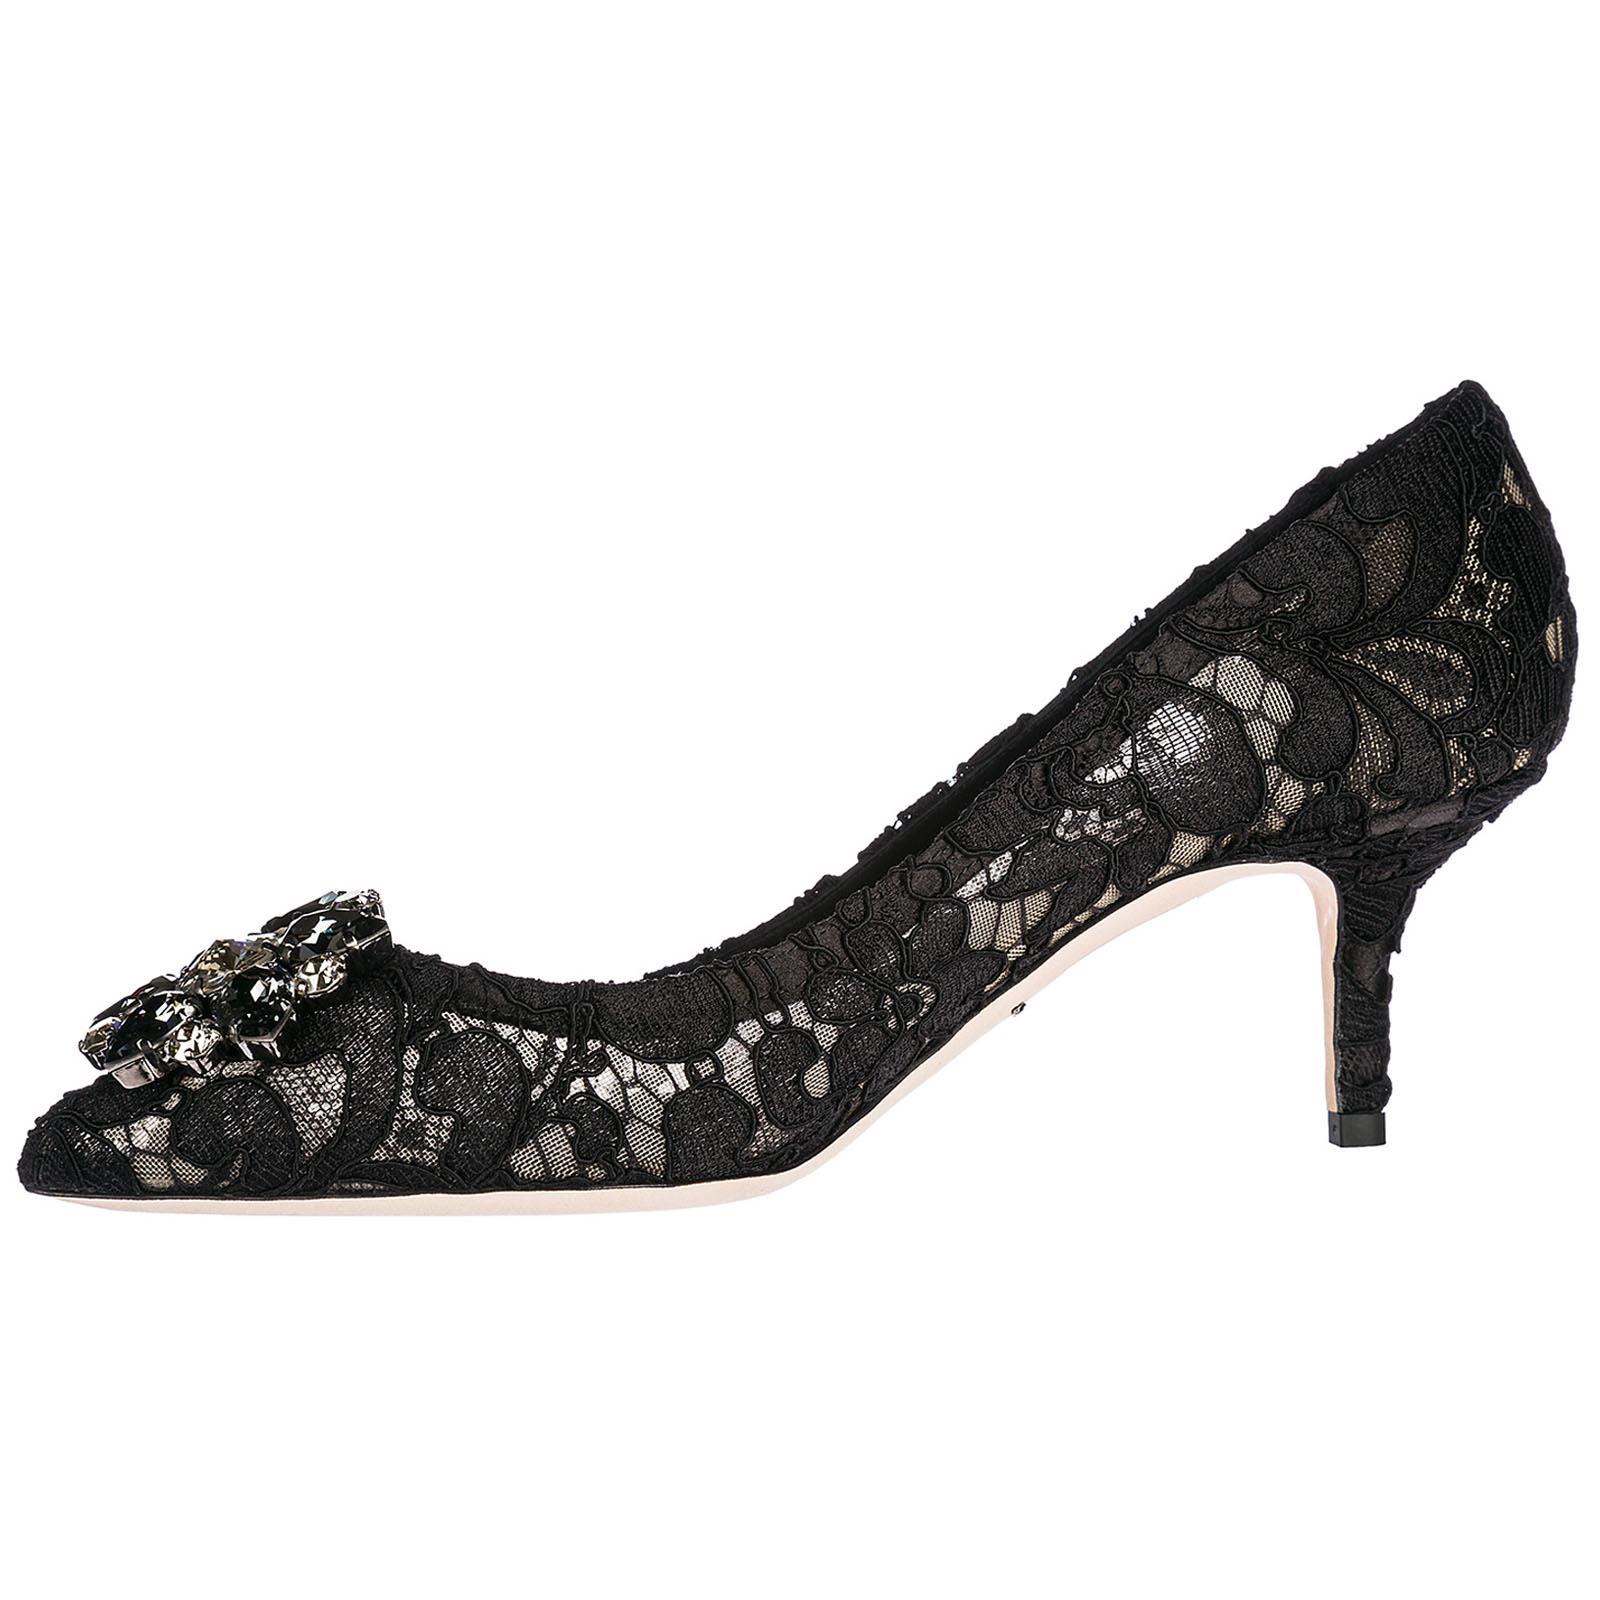 Women's pumps court heel shoes bellucci